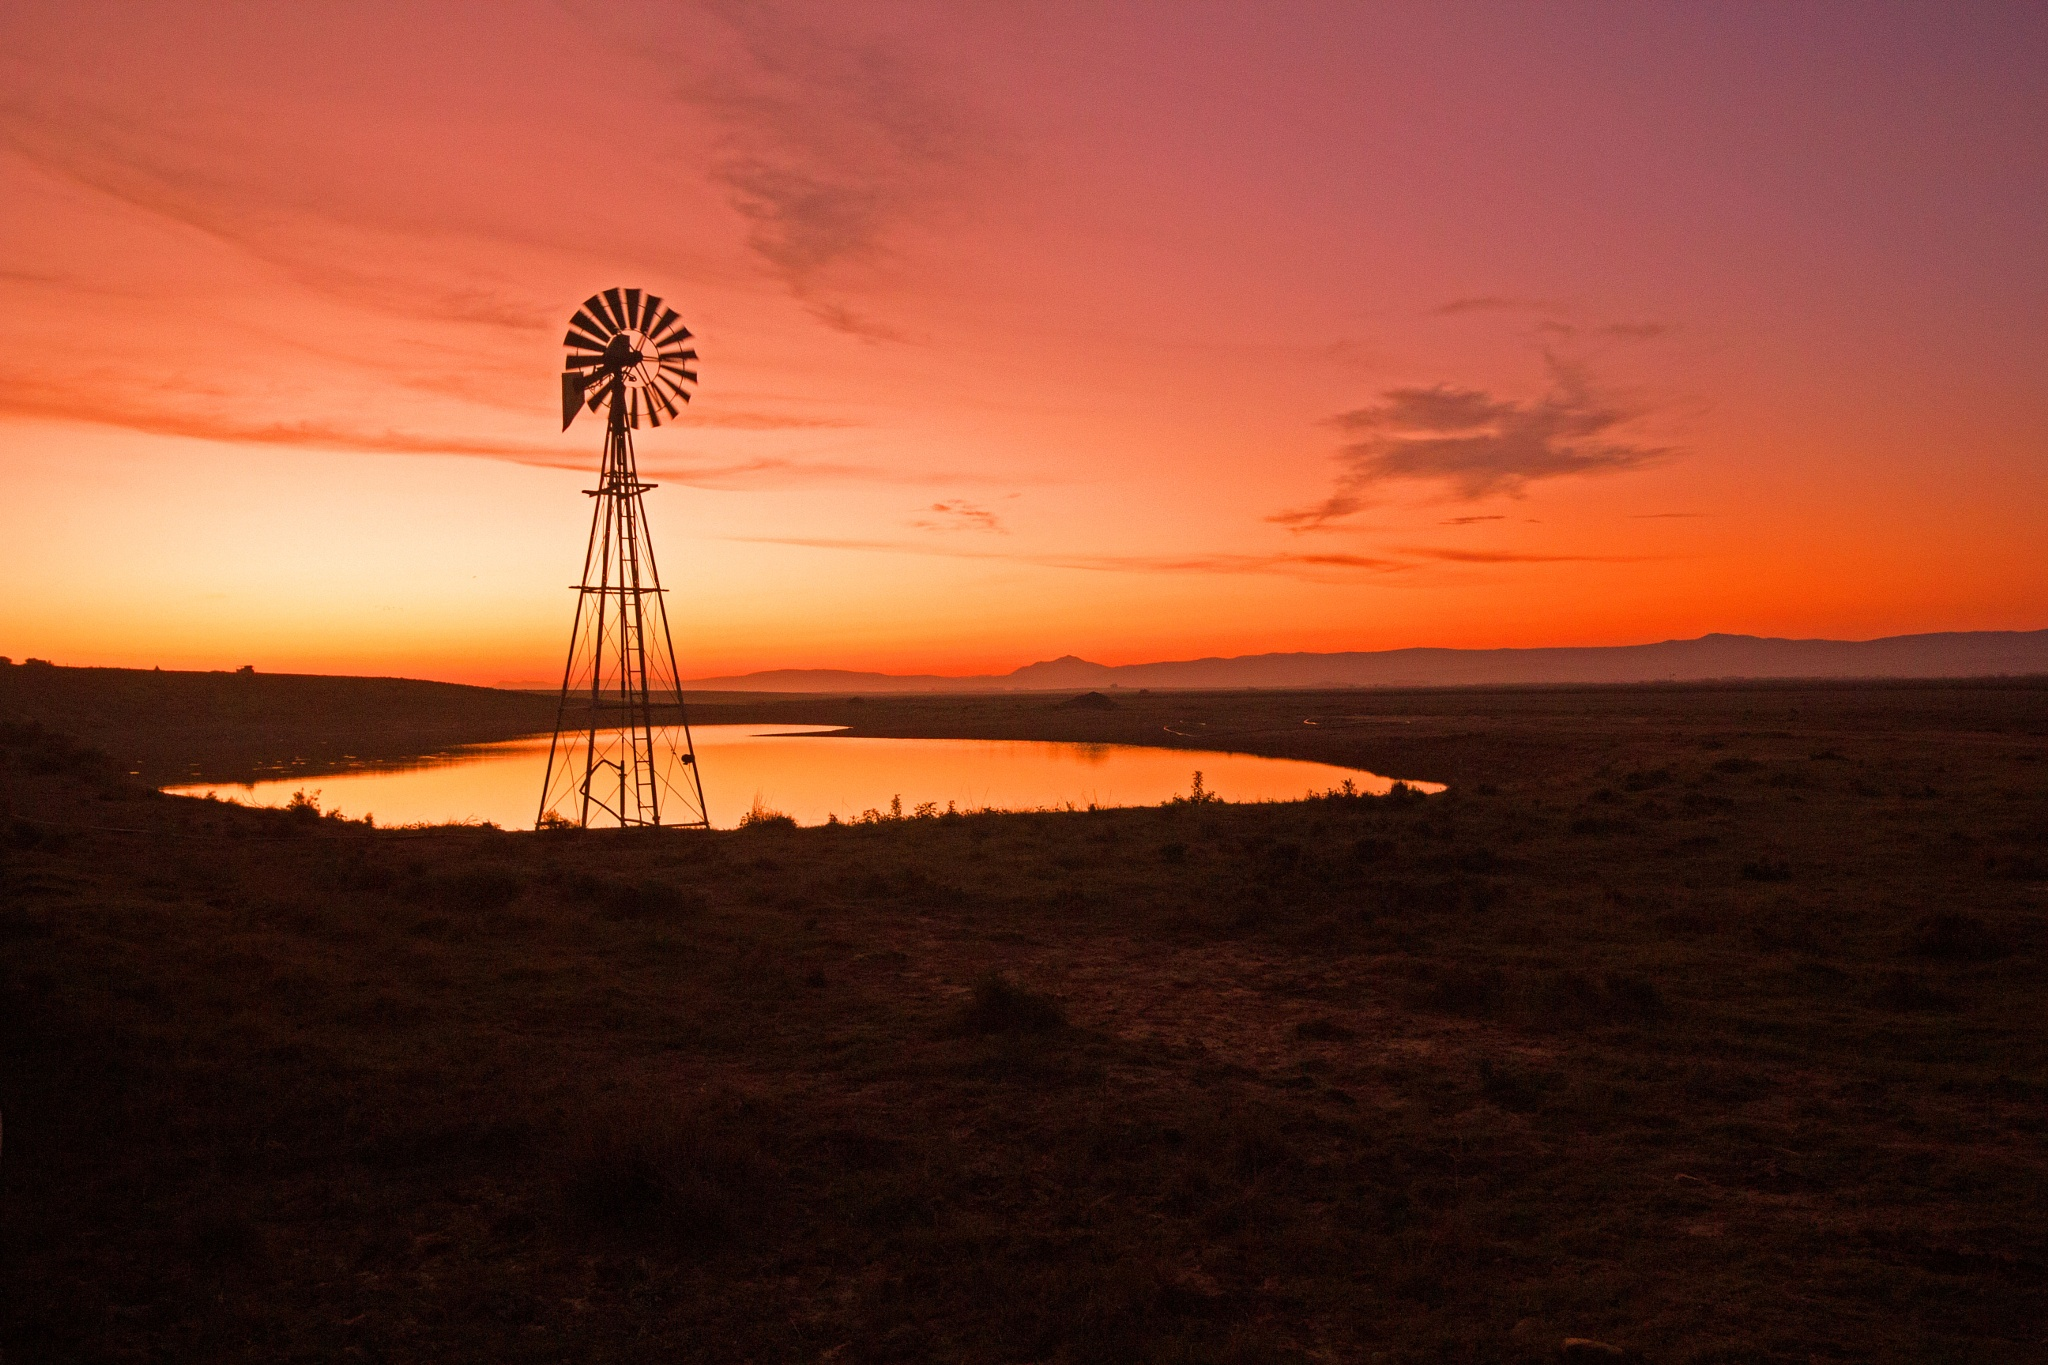 Windmill by Nauta Piscatorque